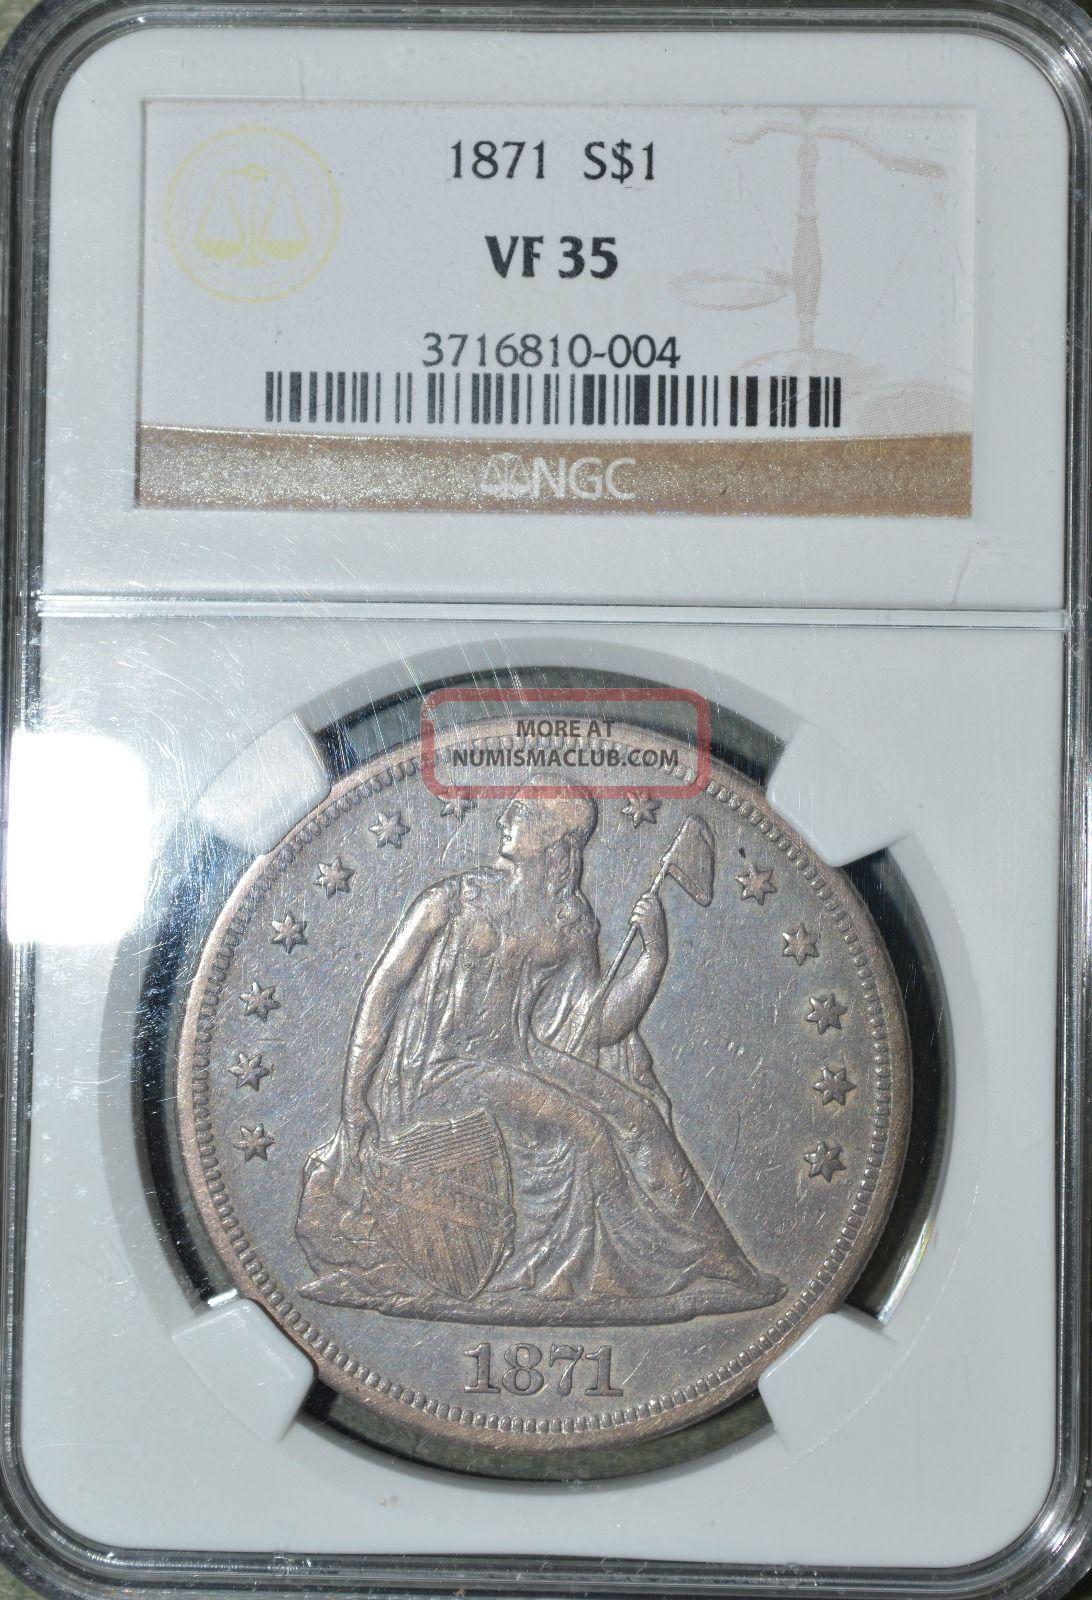 1871 $1 Liberty Seated Dollar Dollars photo